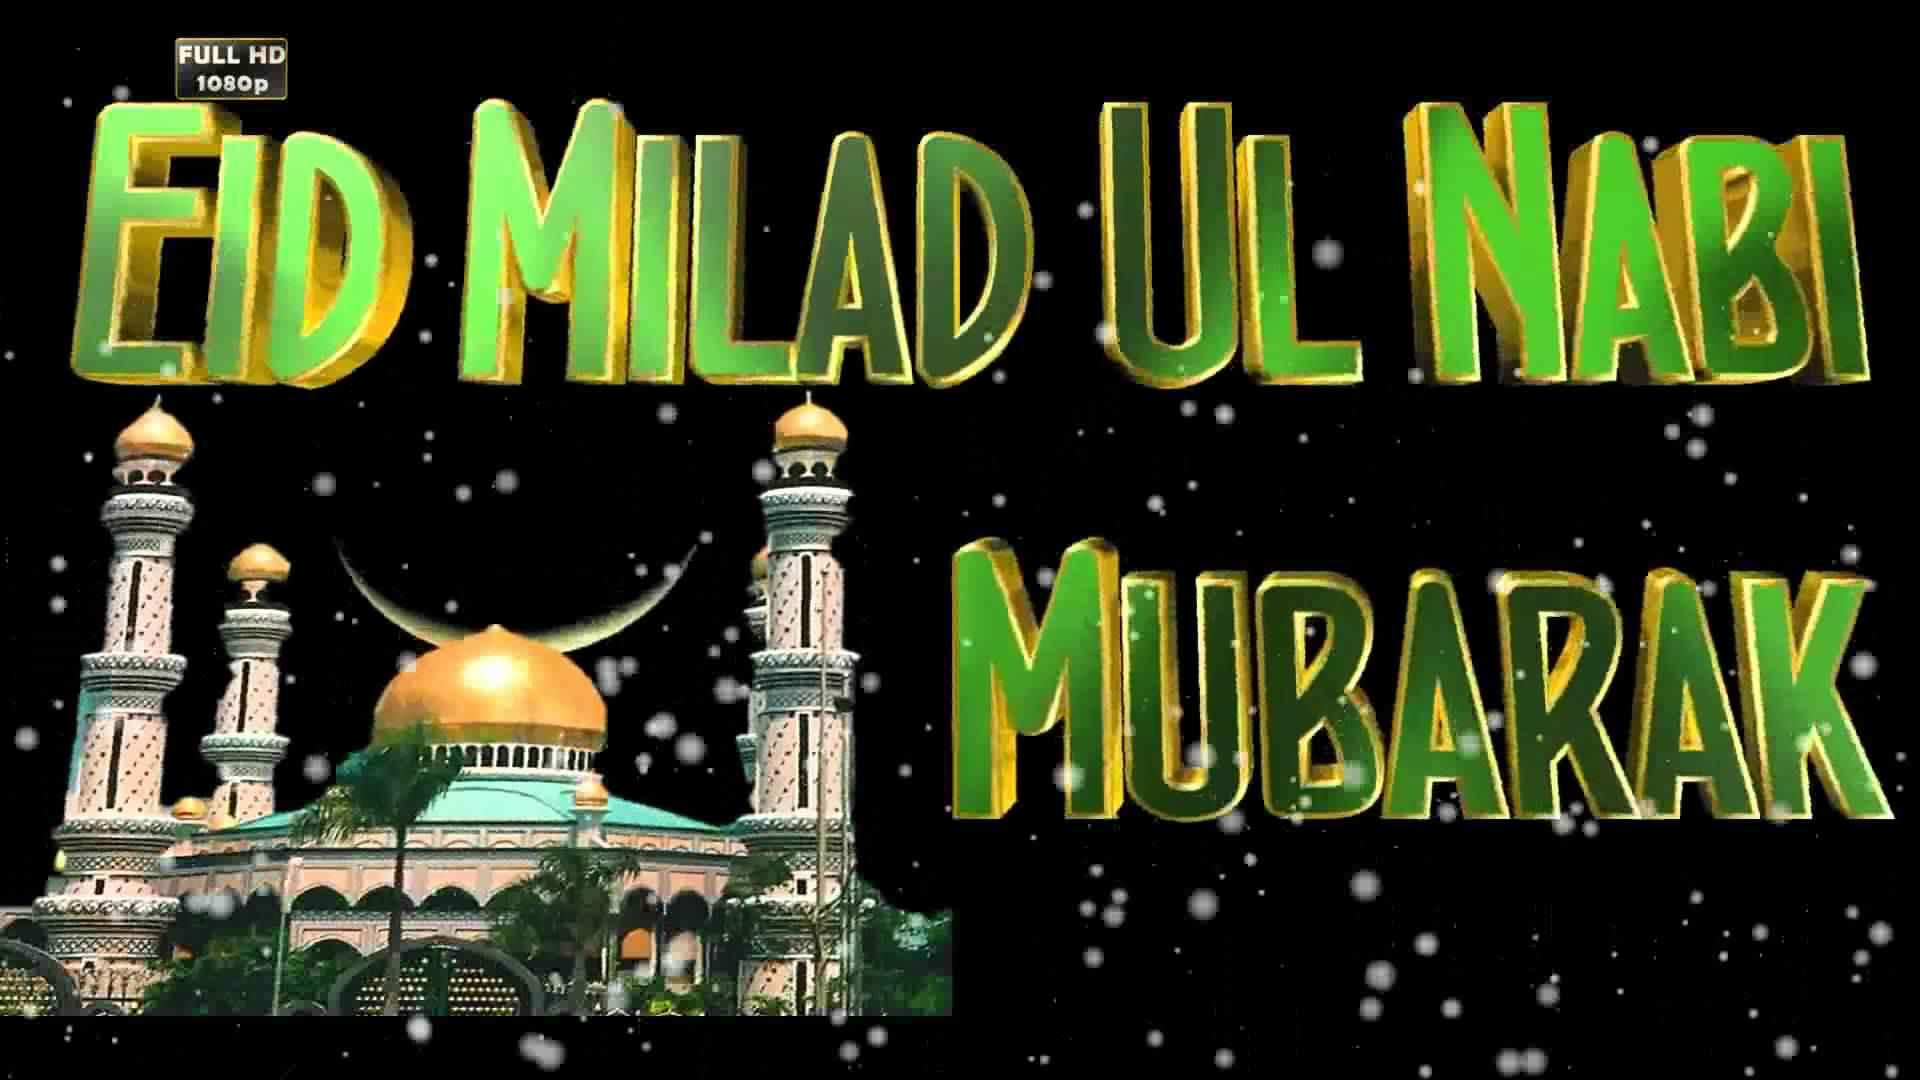 Eid Milad Full Hd Wallpaper 1080